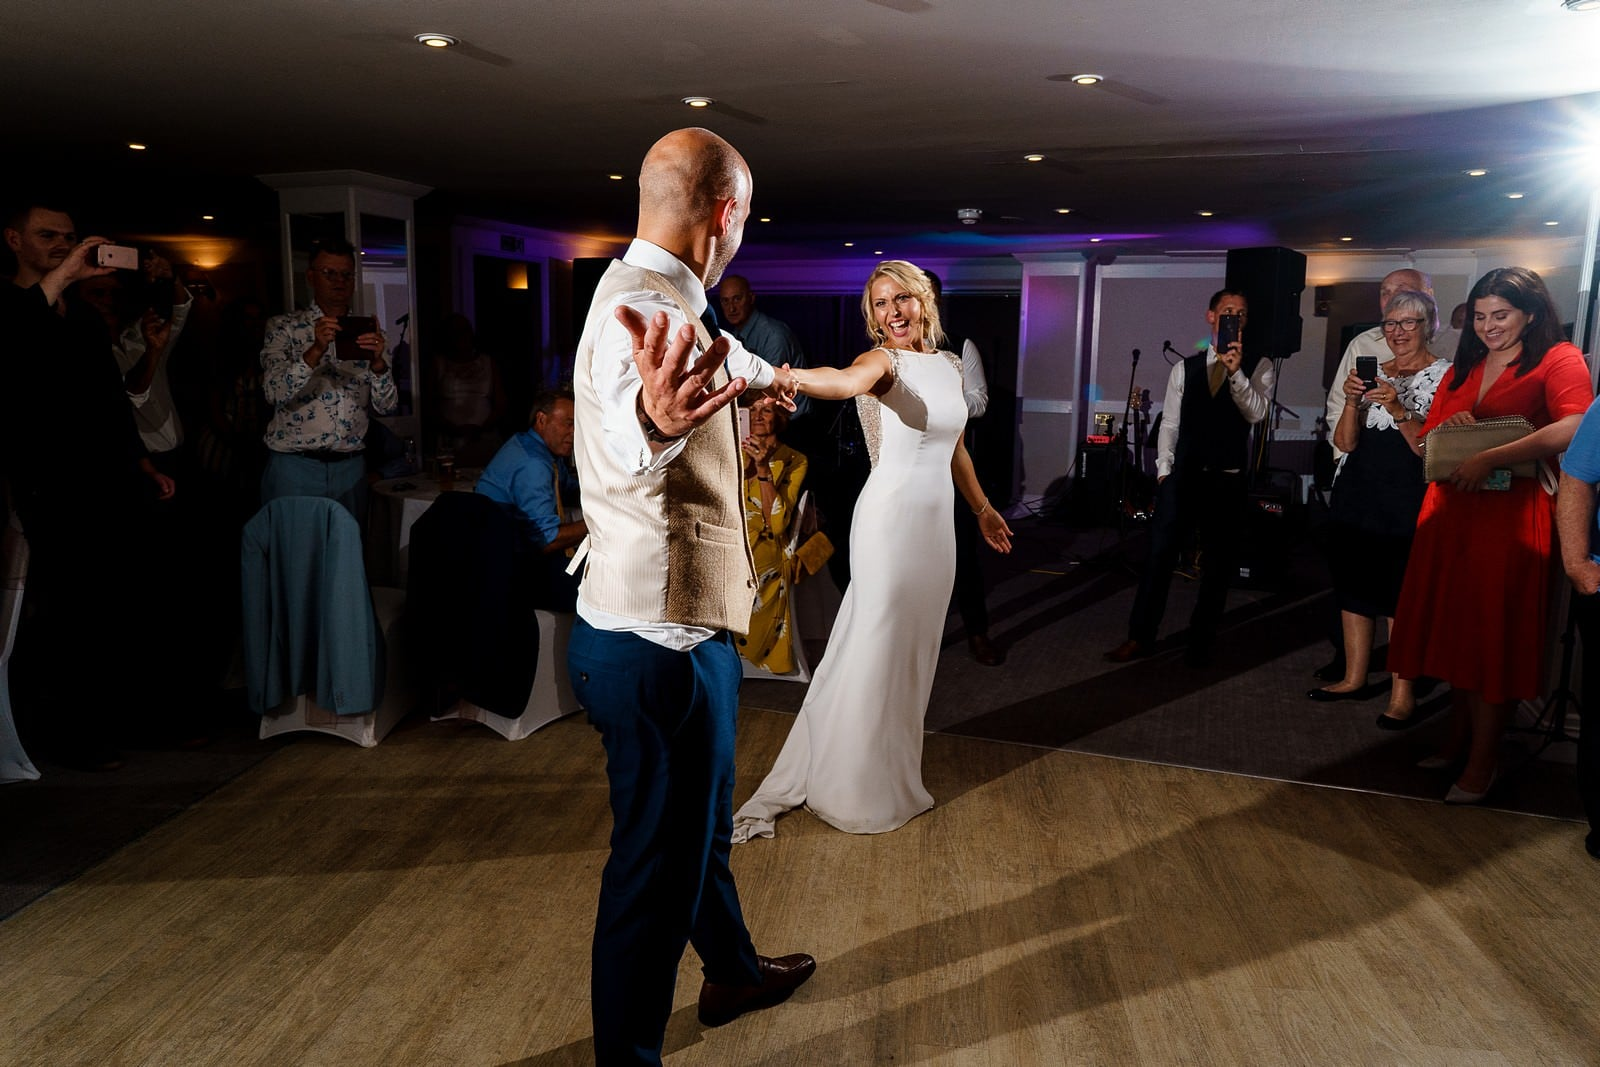 wedding dance a the greenbank hotel